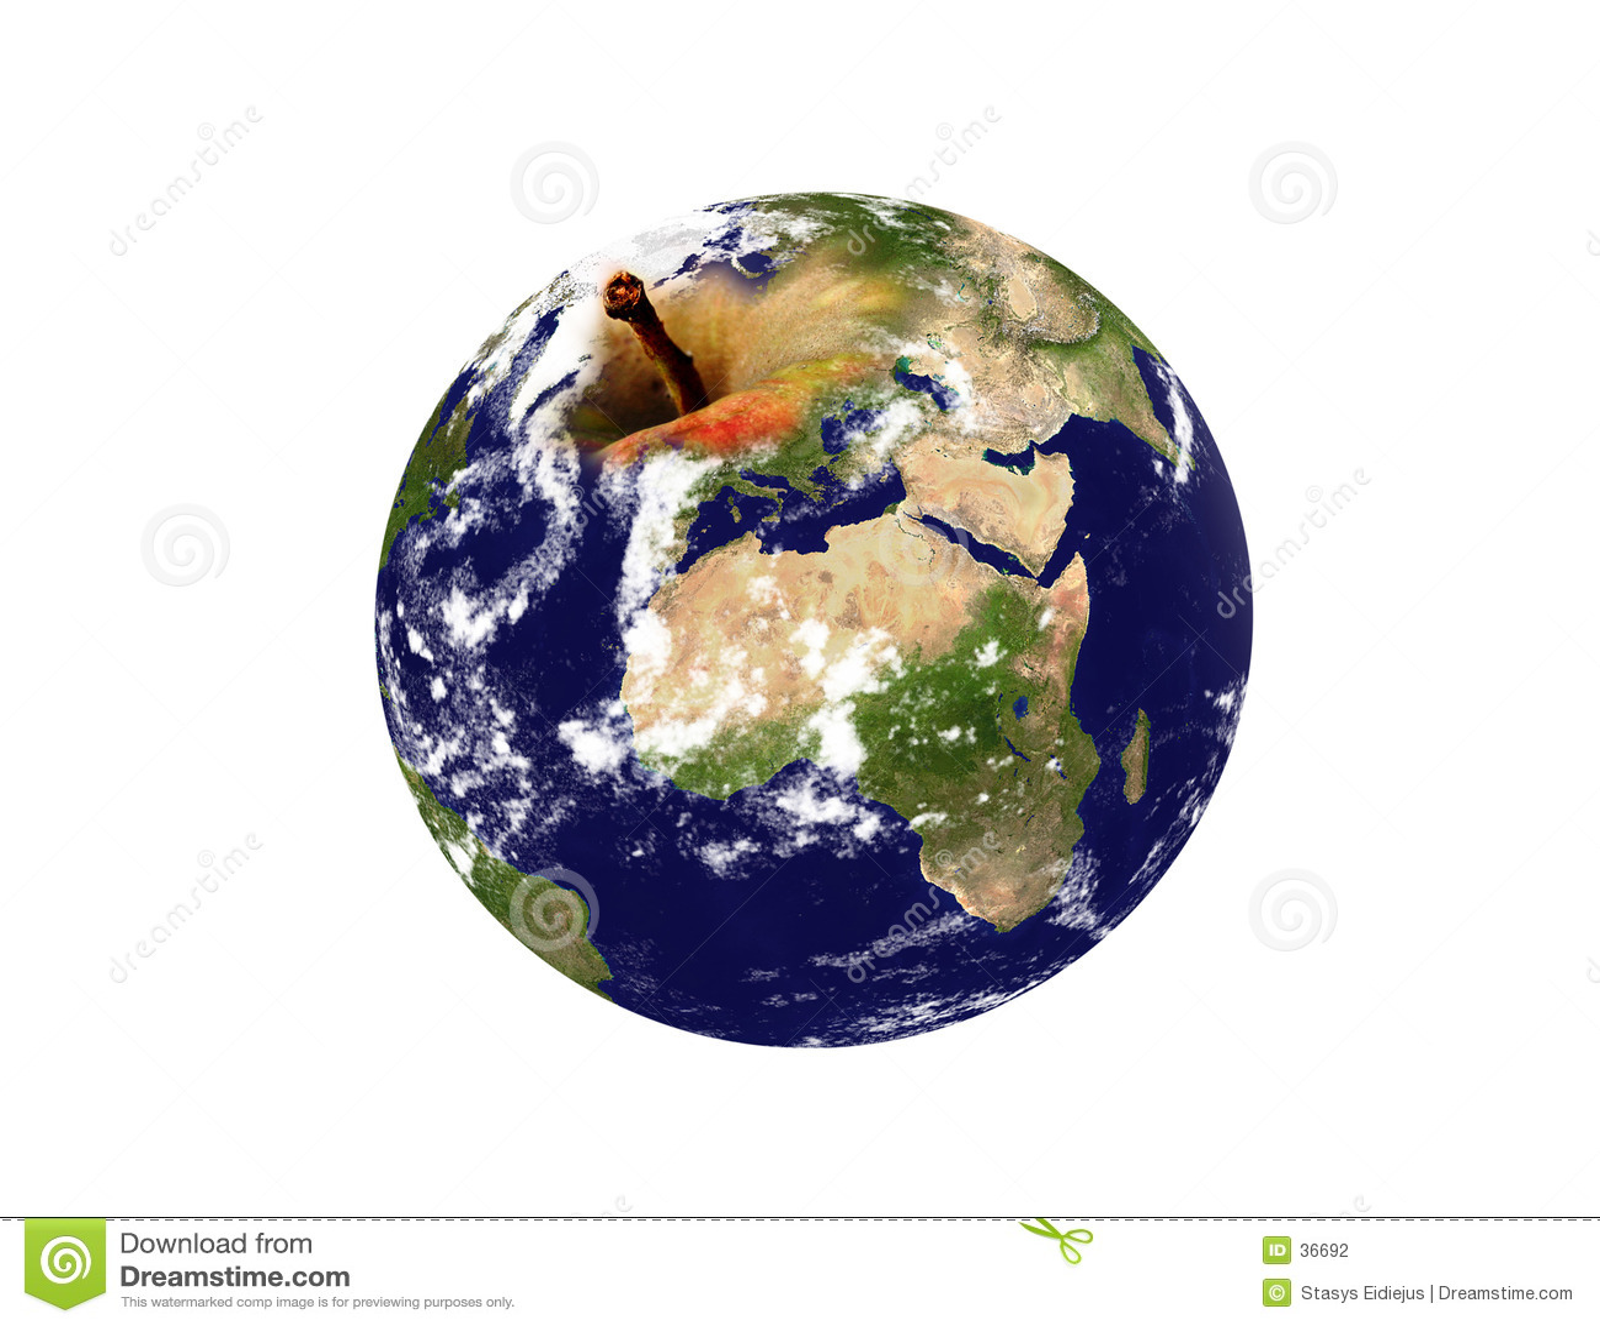 Earth planet- an apple